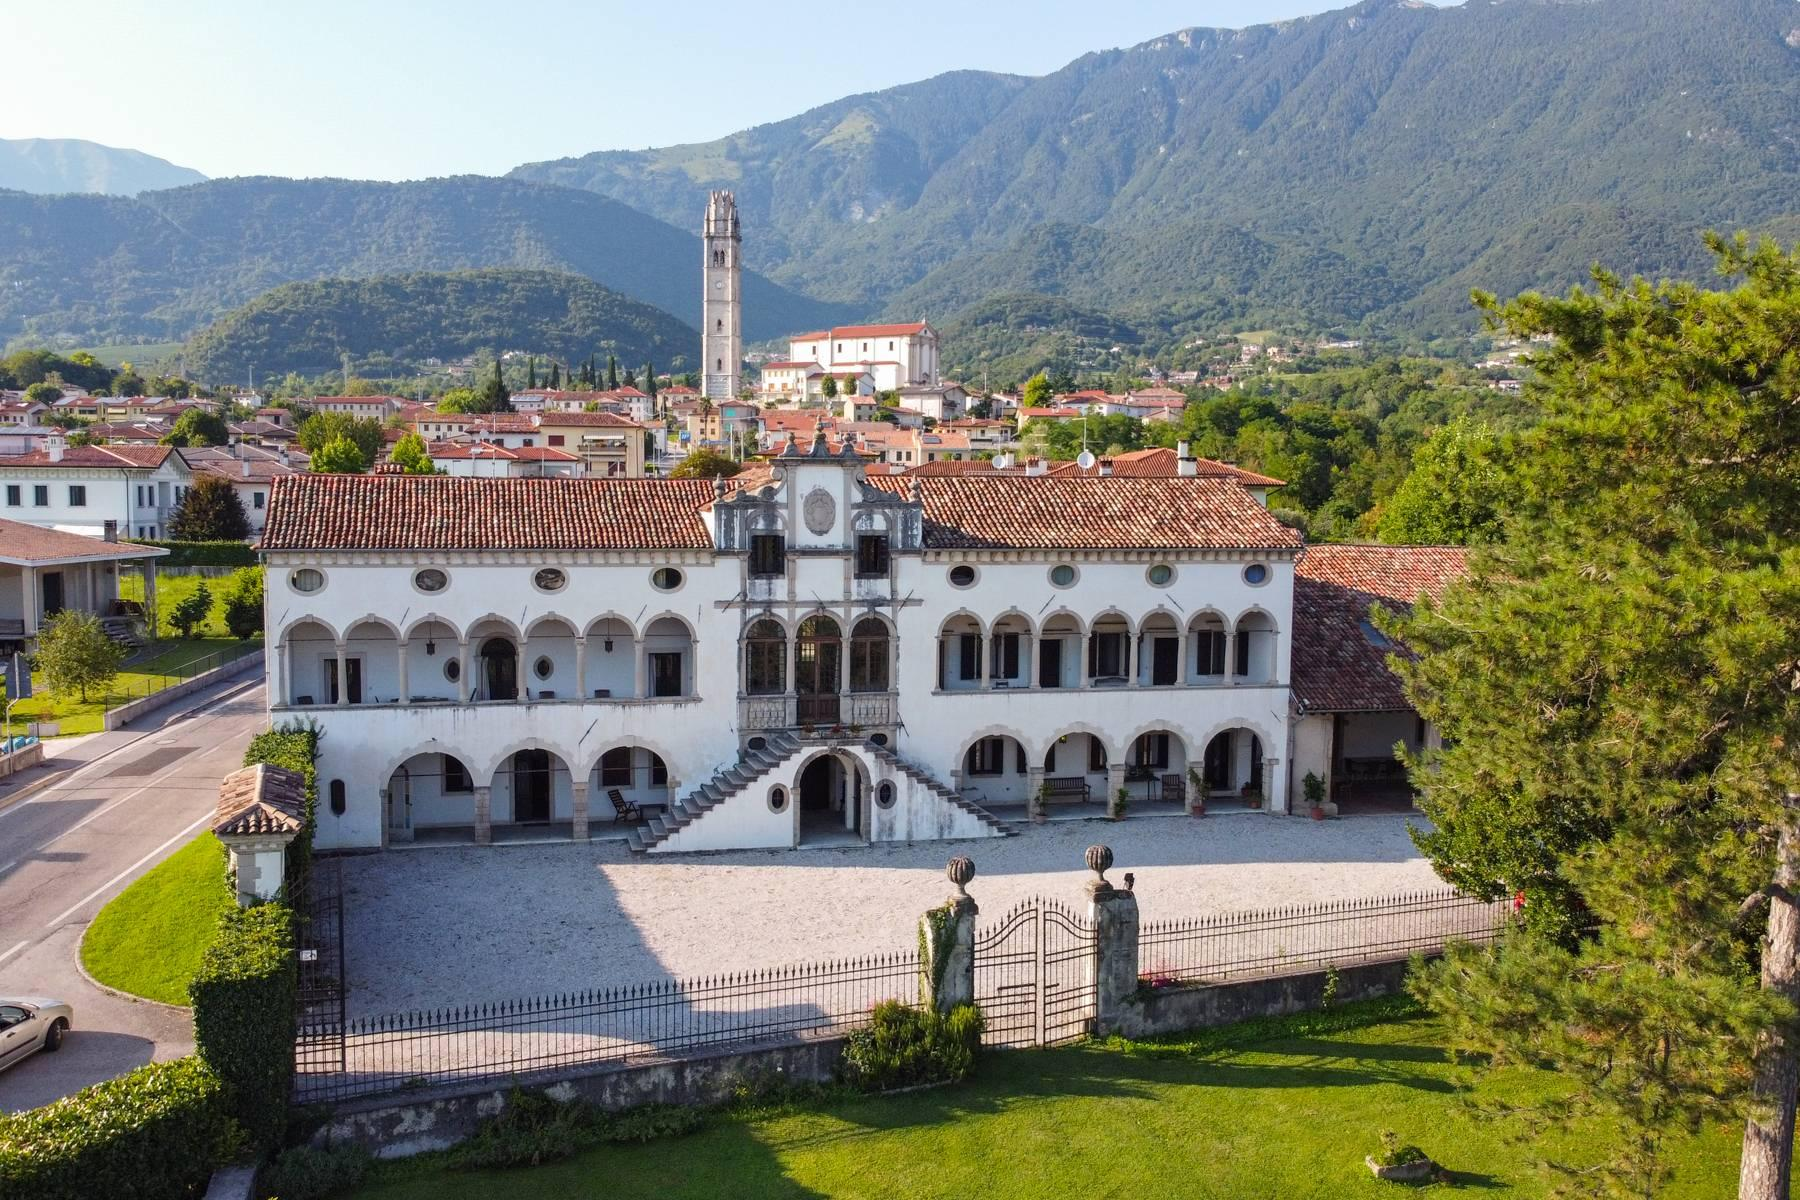 Elegant 17th century Venetian Villa with park on the hills of Treviso - 35